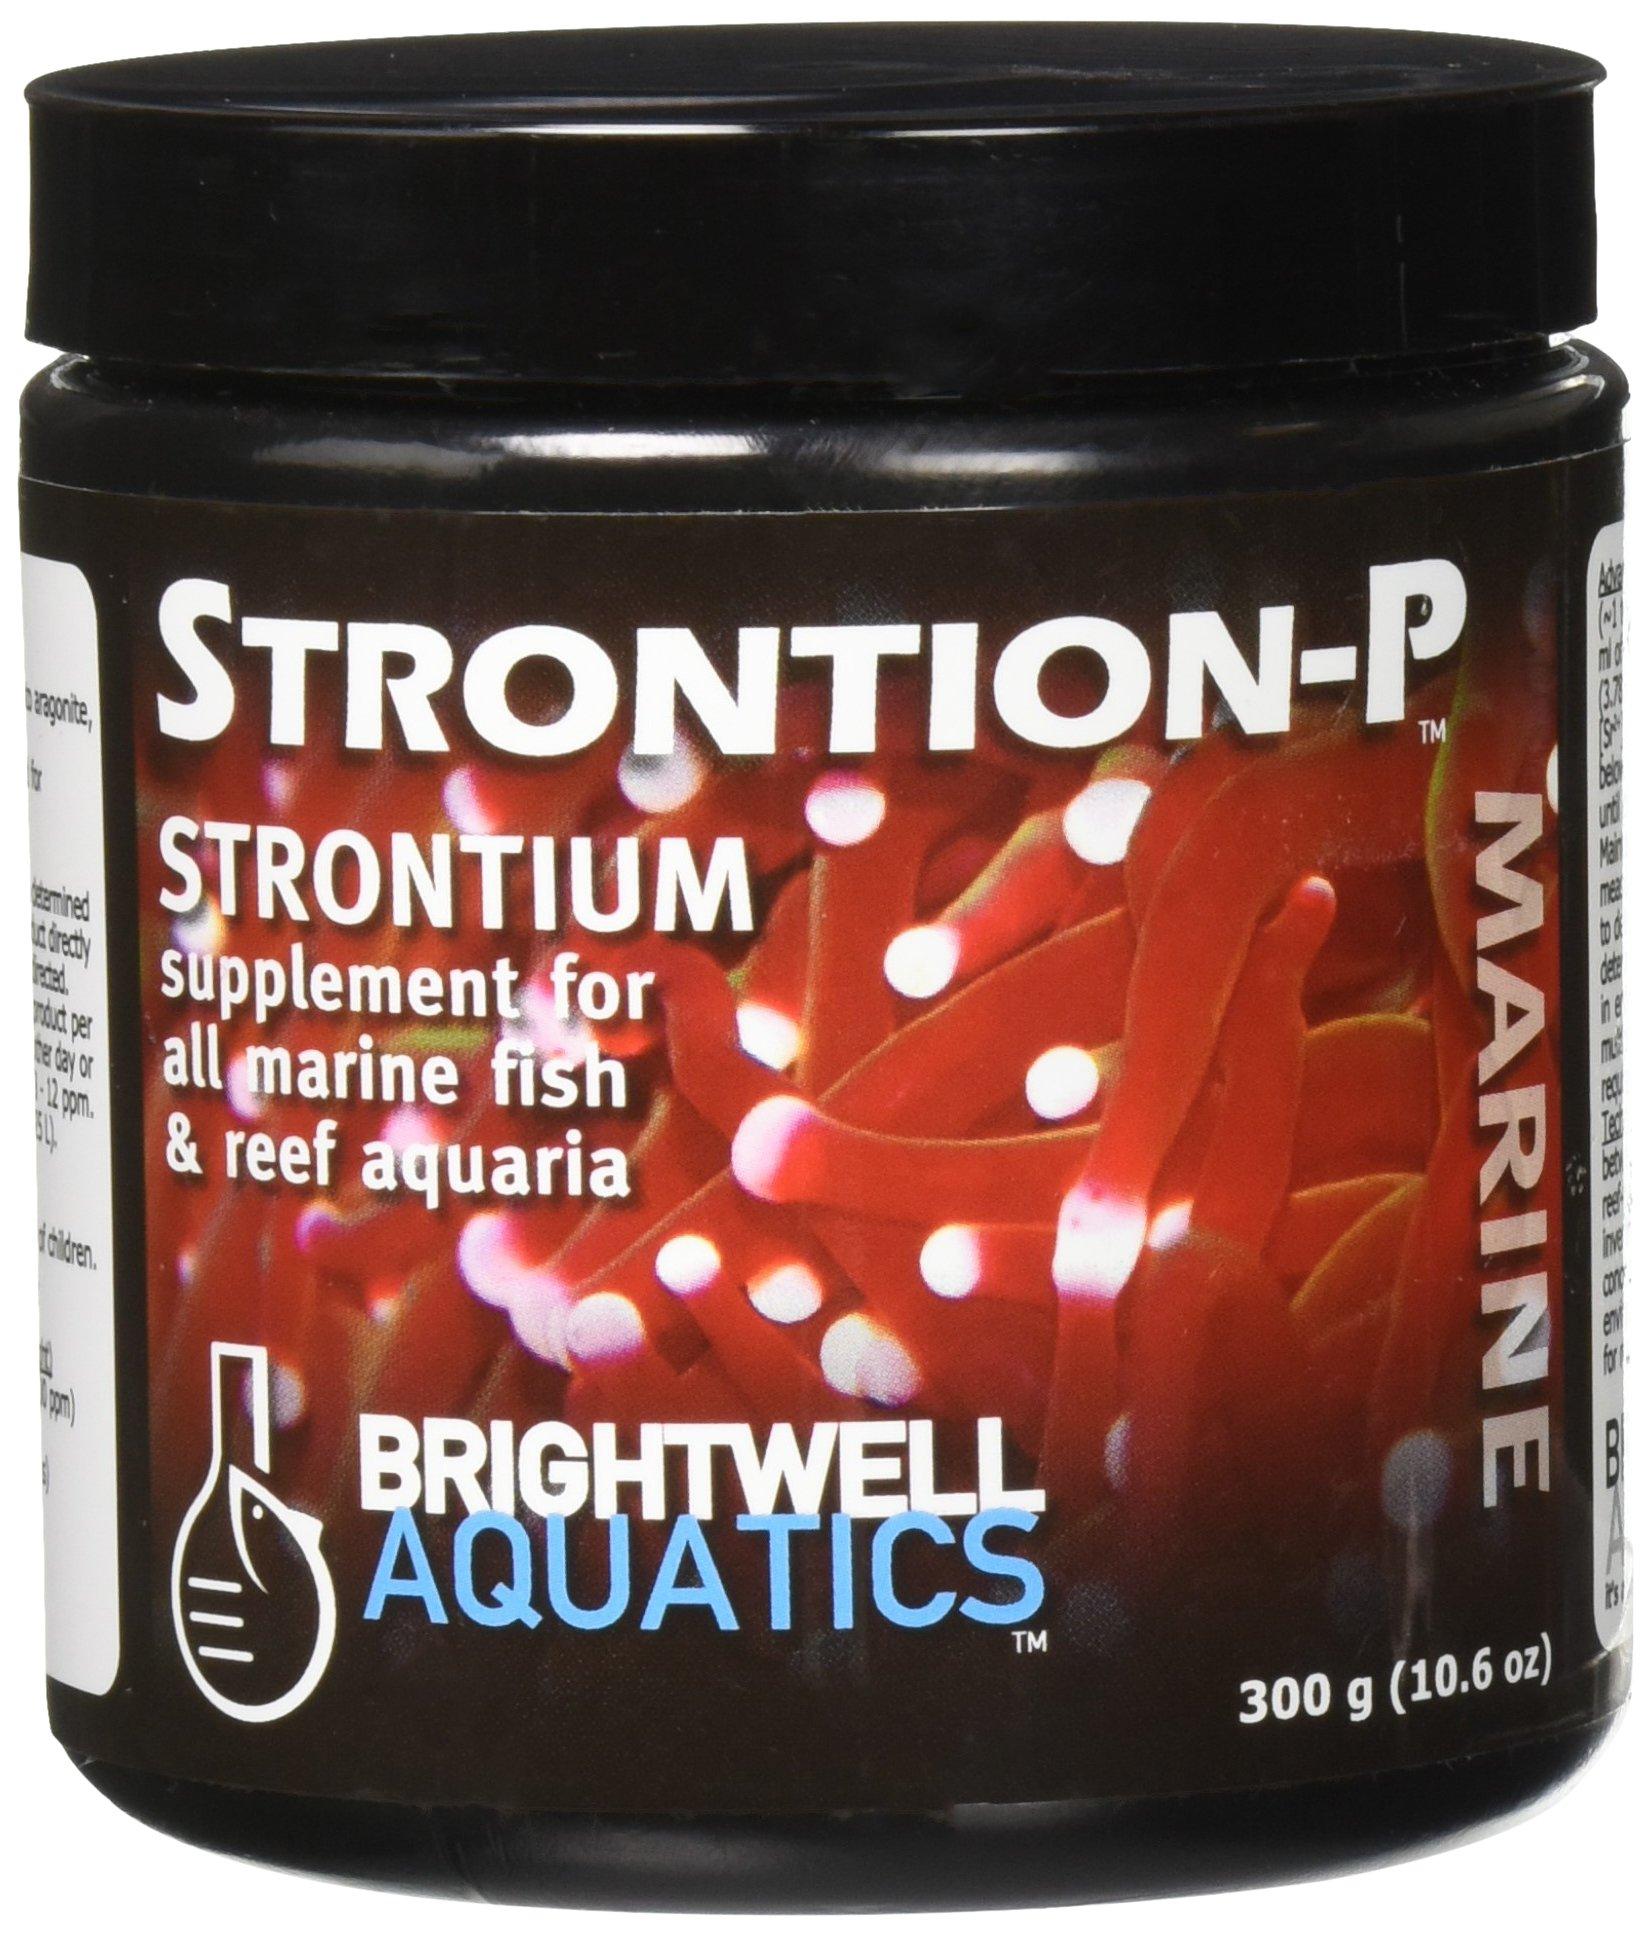 Brightwell Aquatics Strontion-P Dry Strontium Supplement, 300 grams